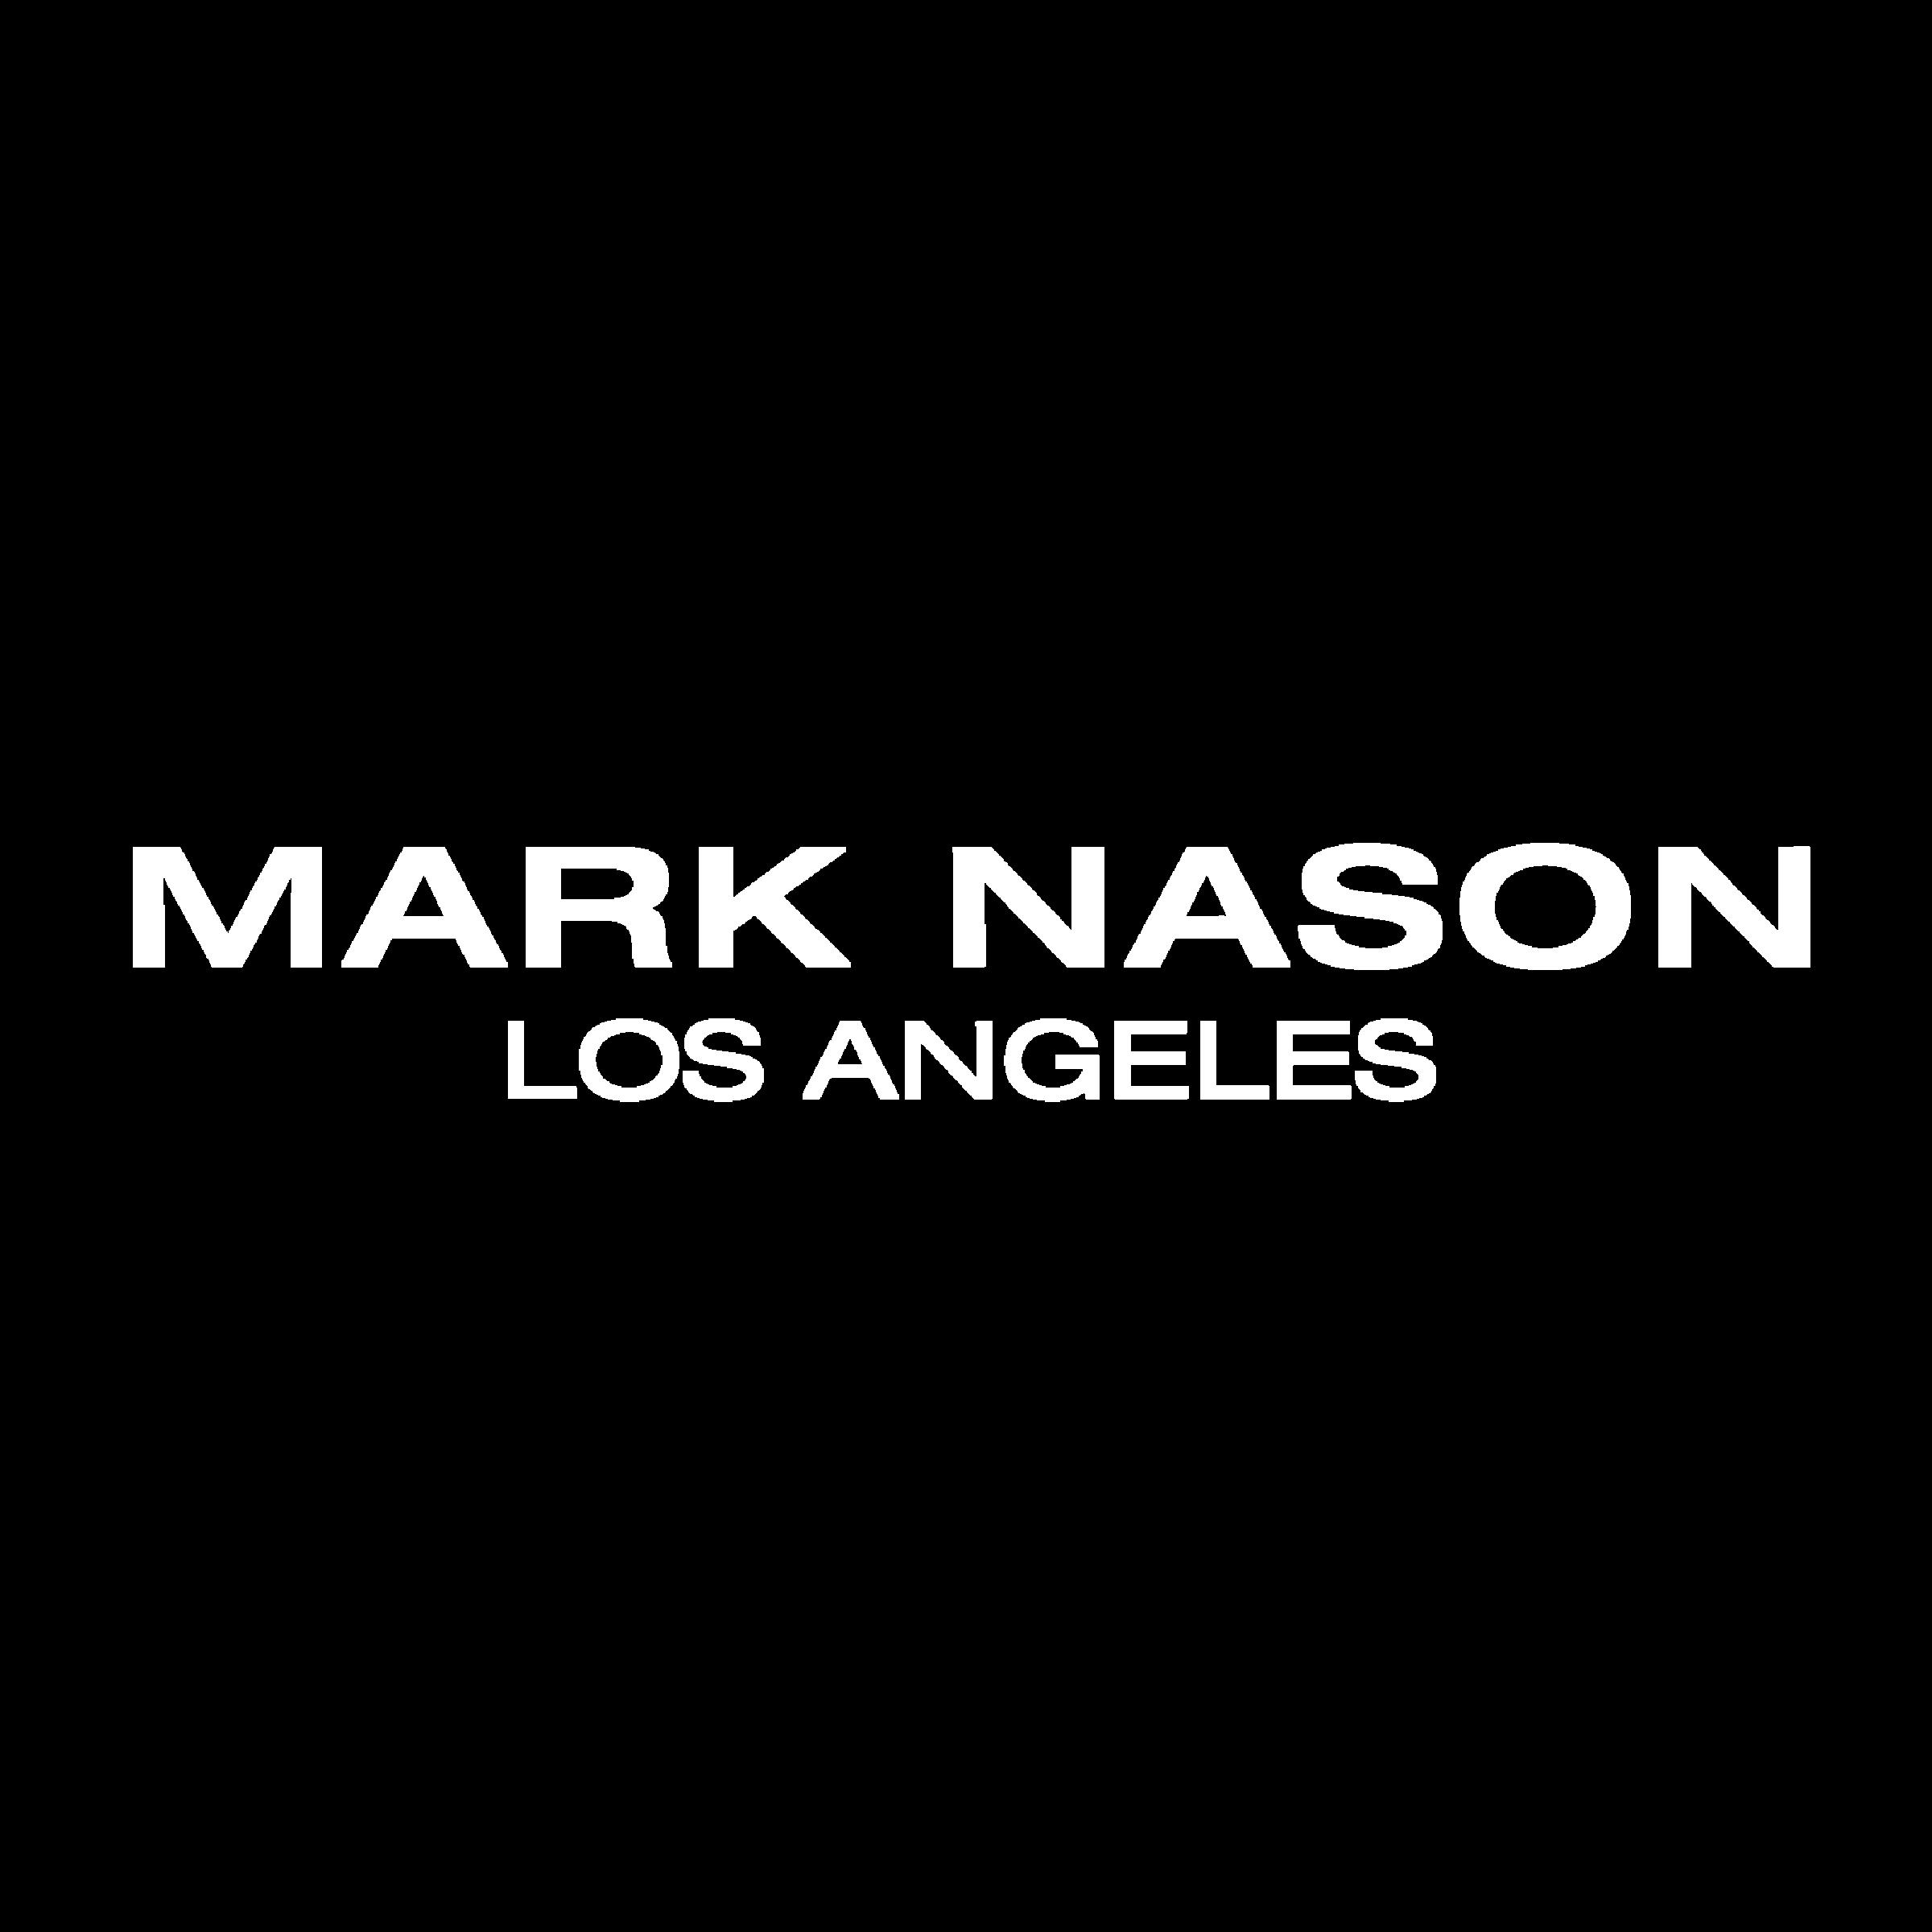 Mark Nason Logo